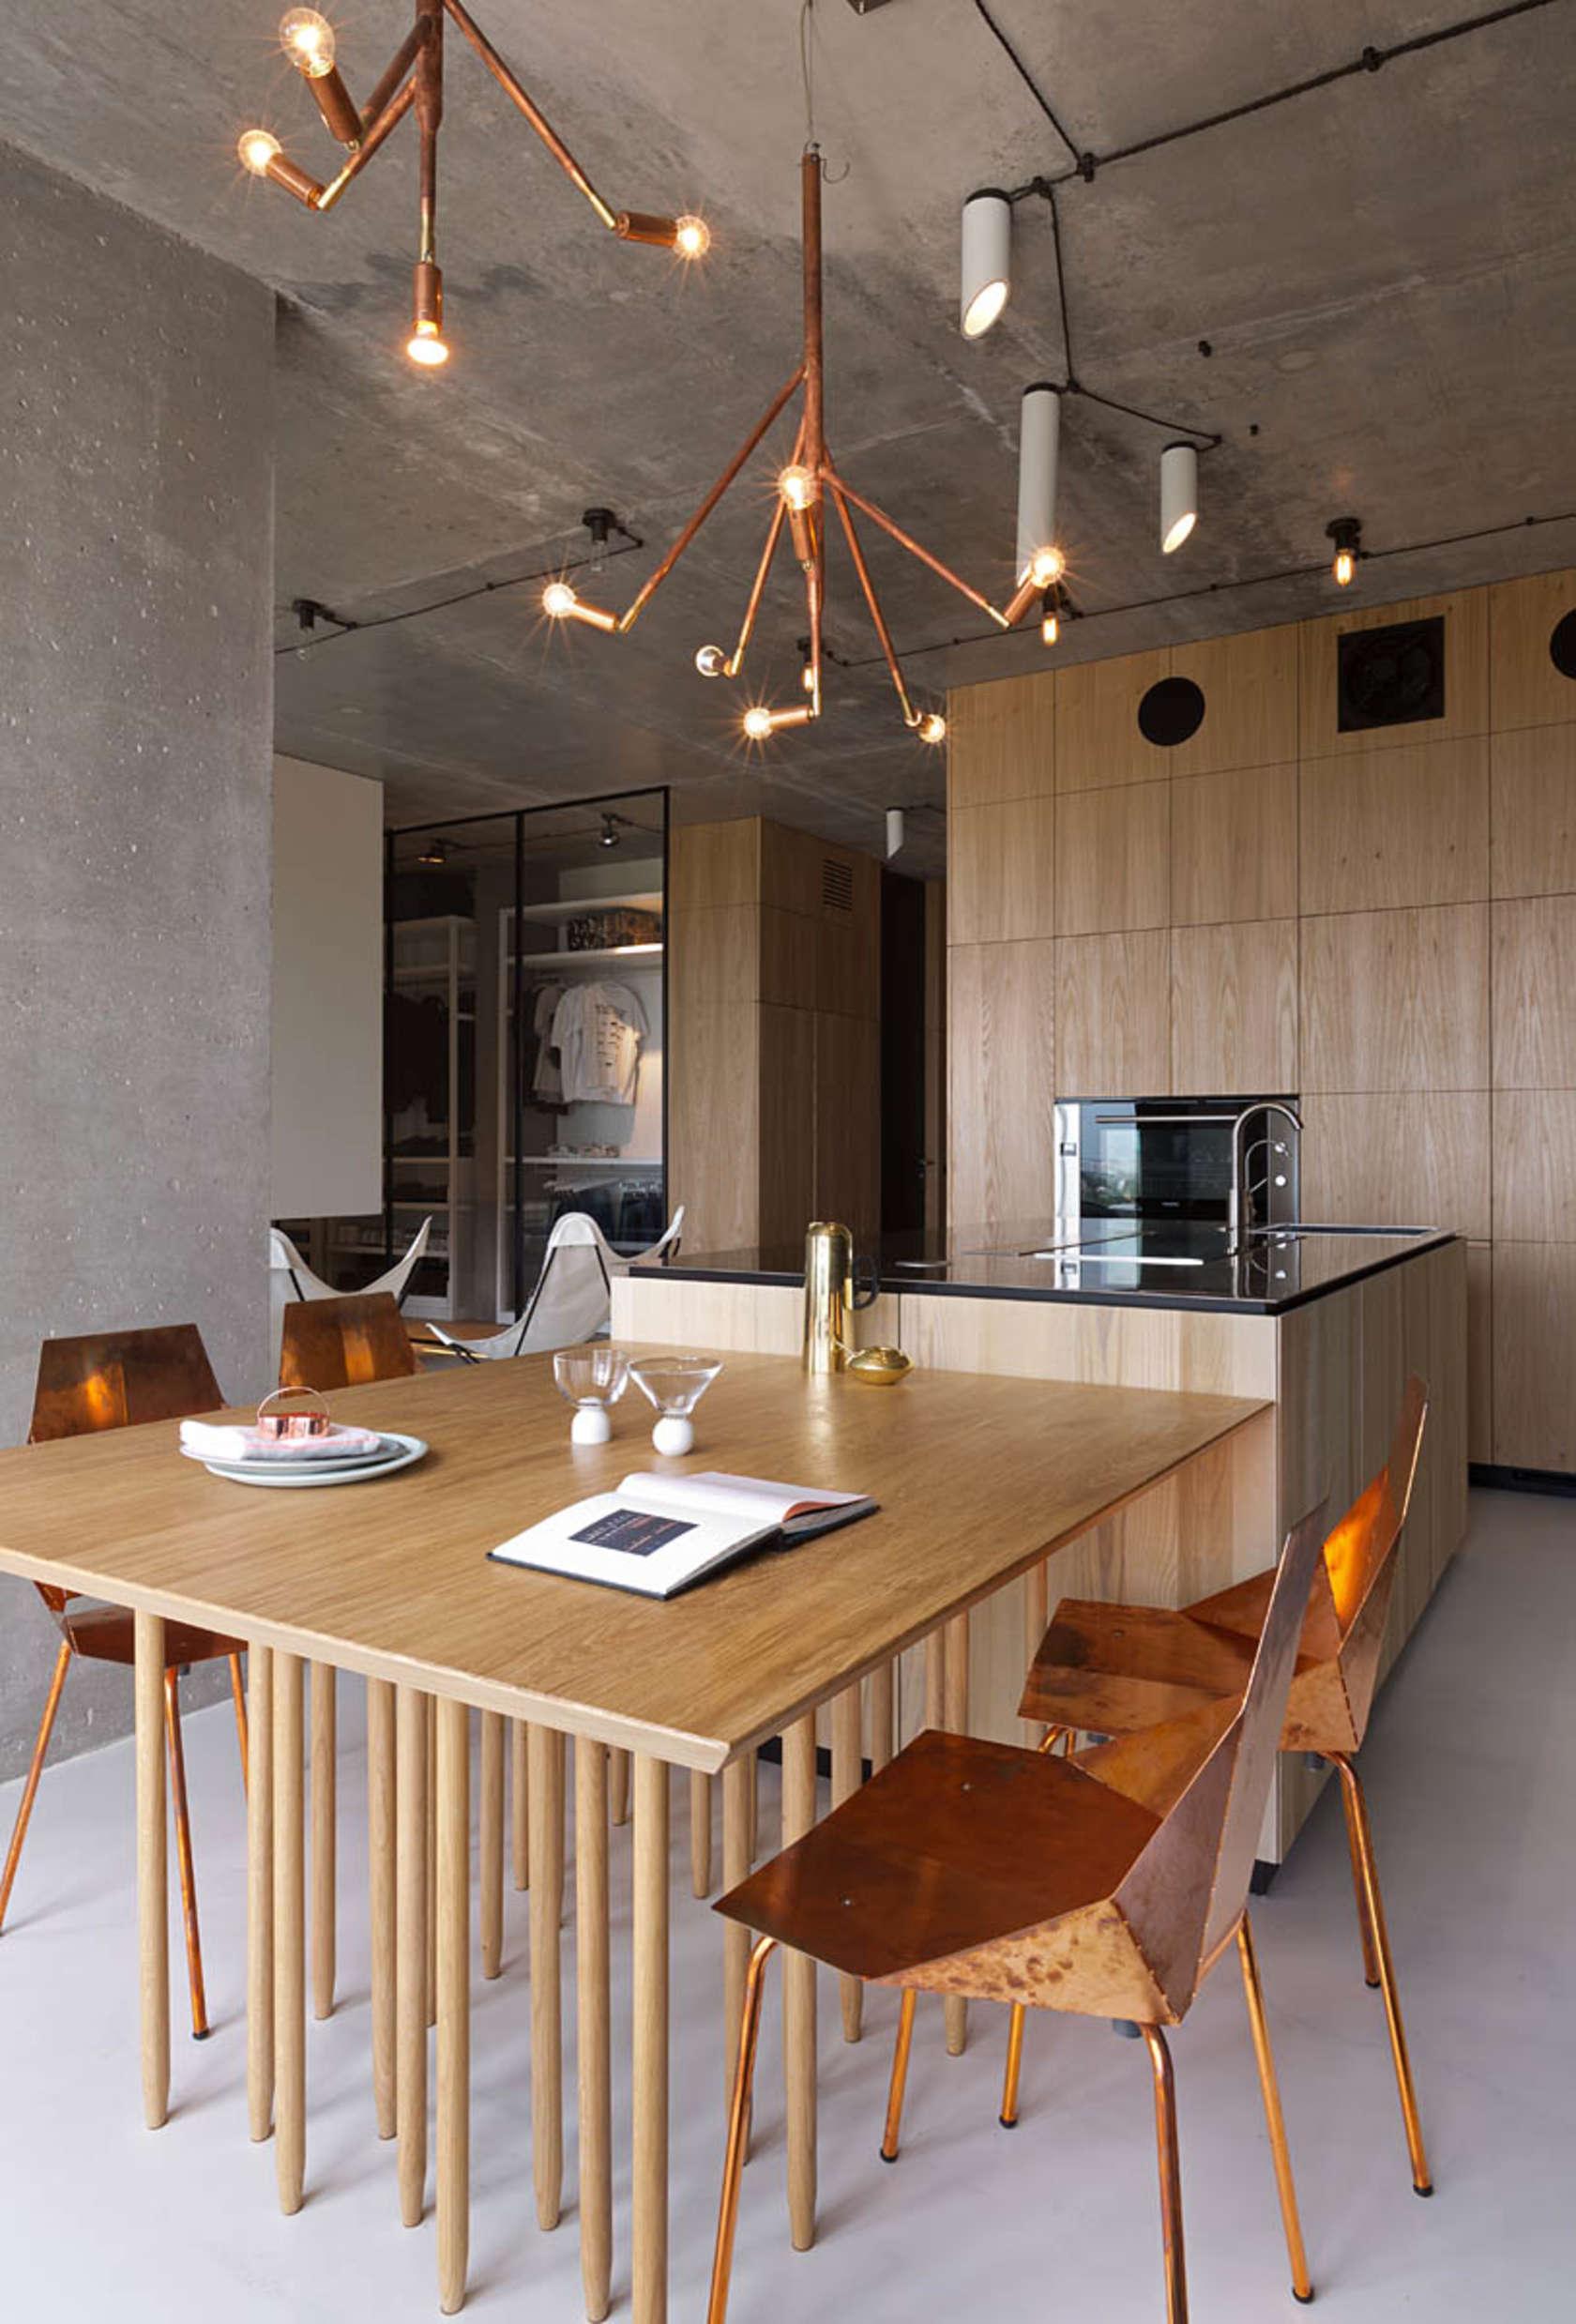 Image of: Copper Light Fixturesinterior Design Ideas